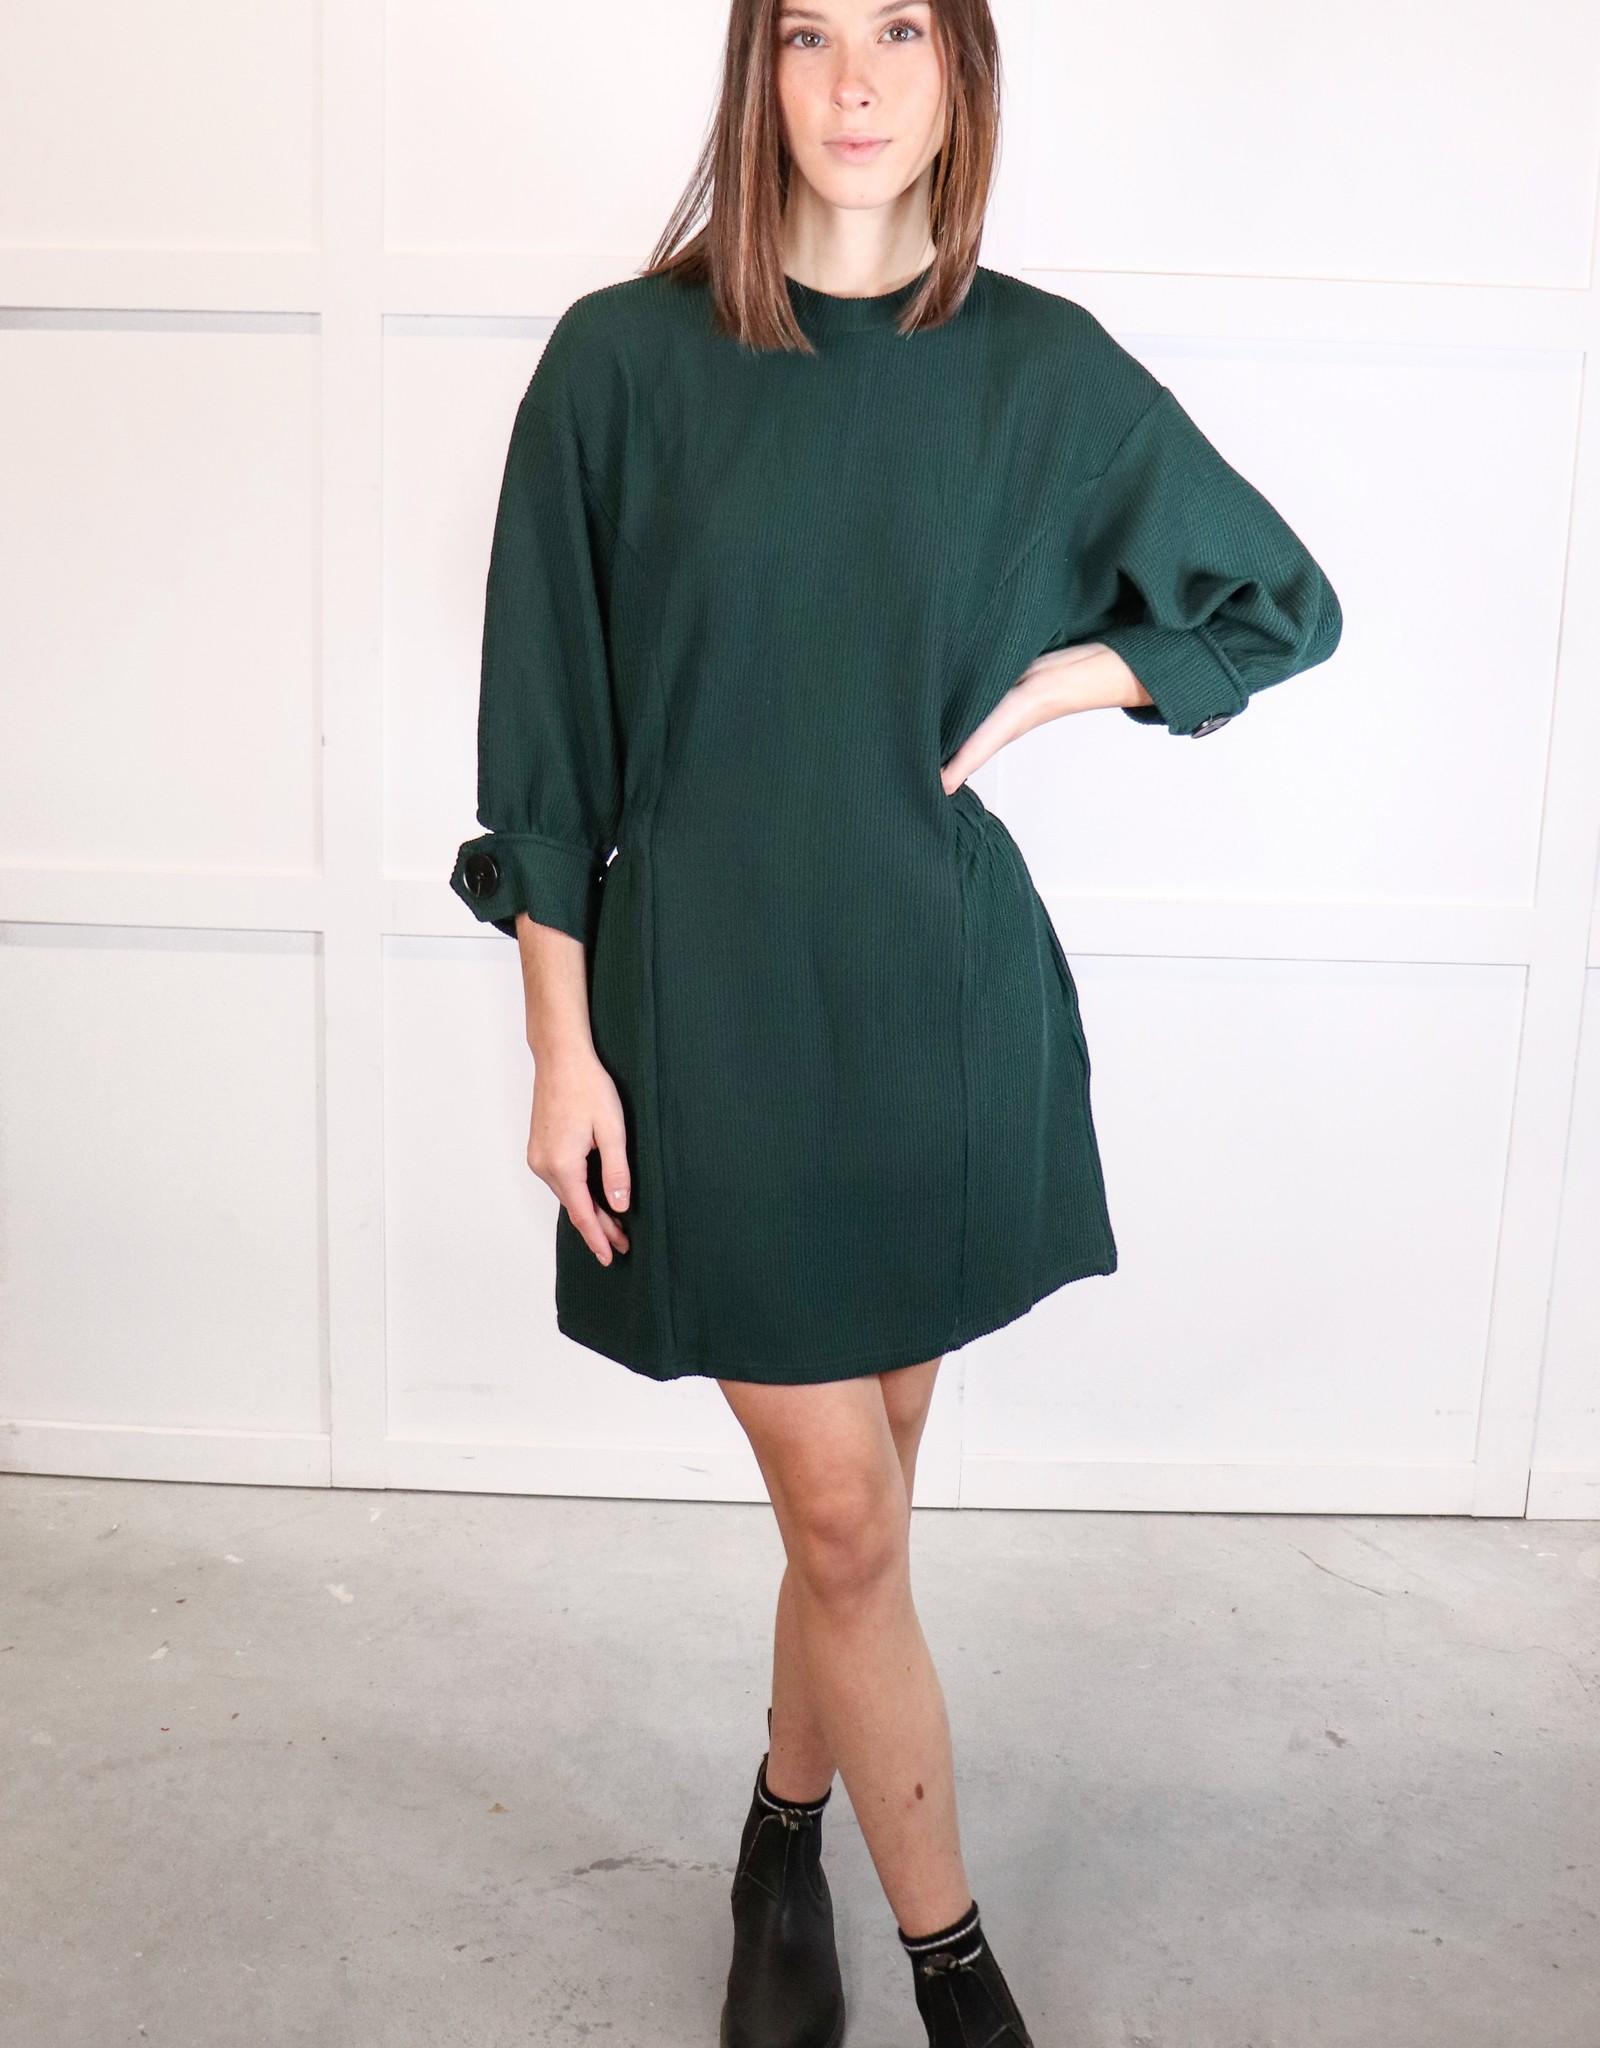 HUSH Elbow slv textured dress